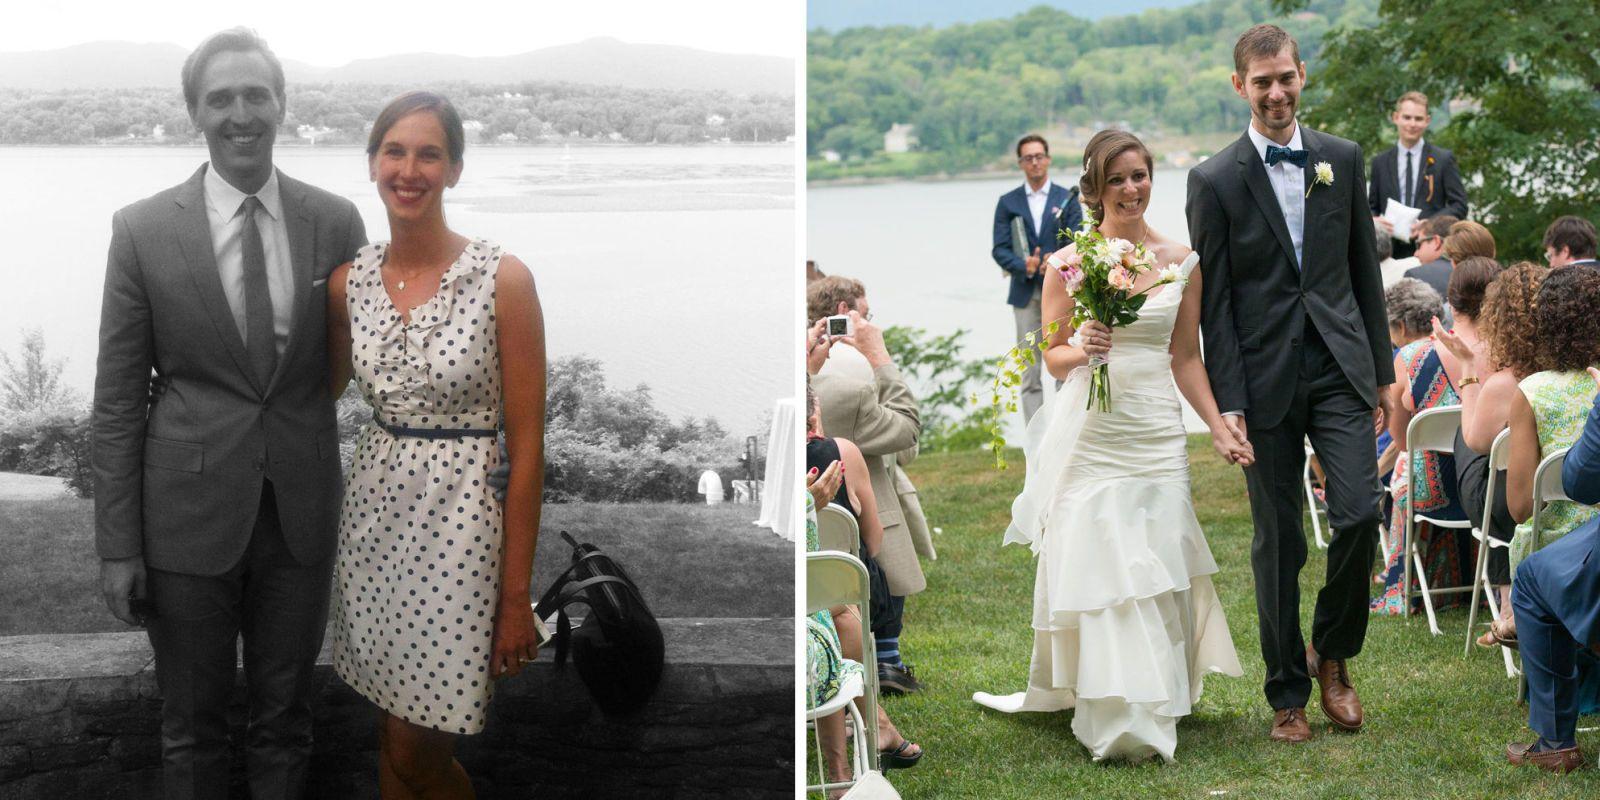 I Wore White to My Friend's Wedding